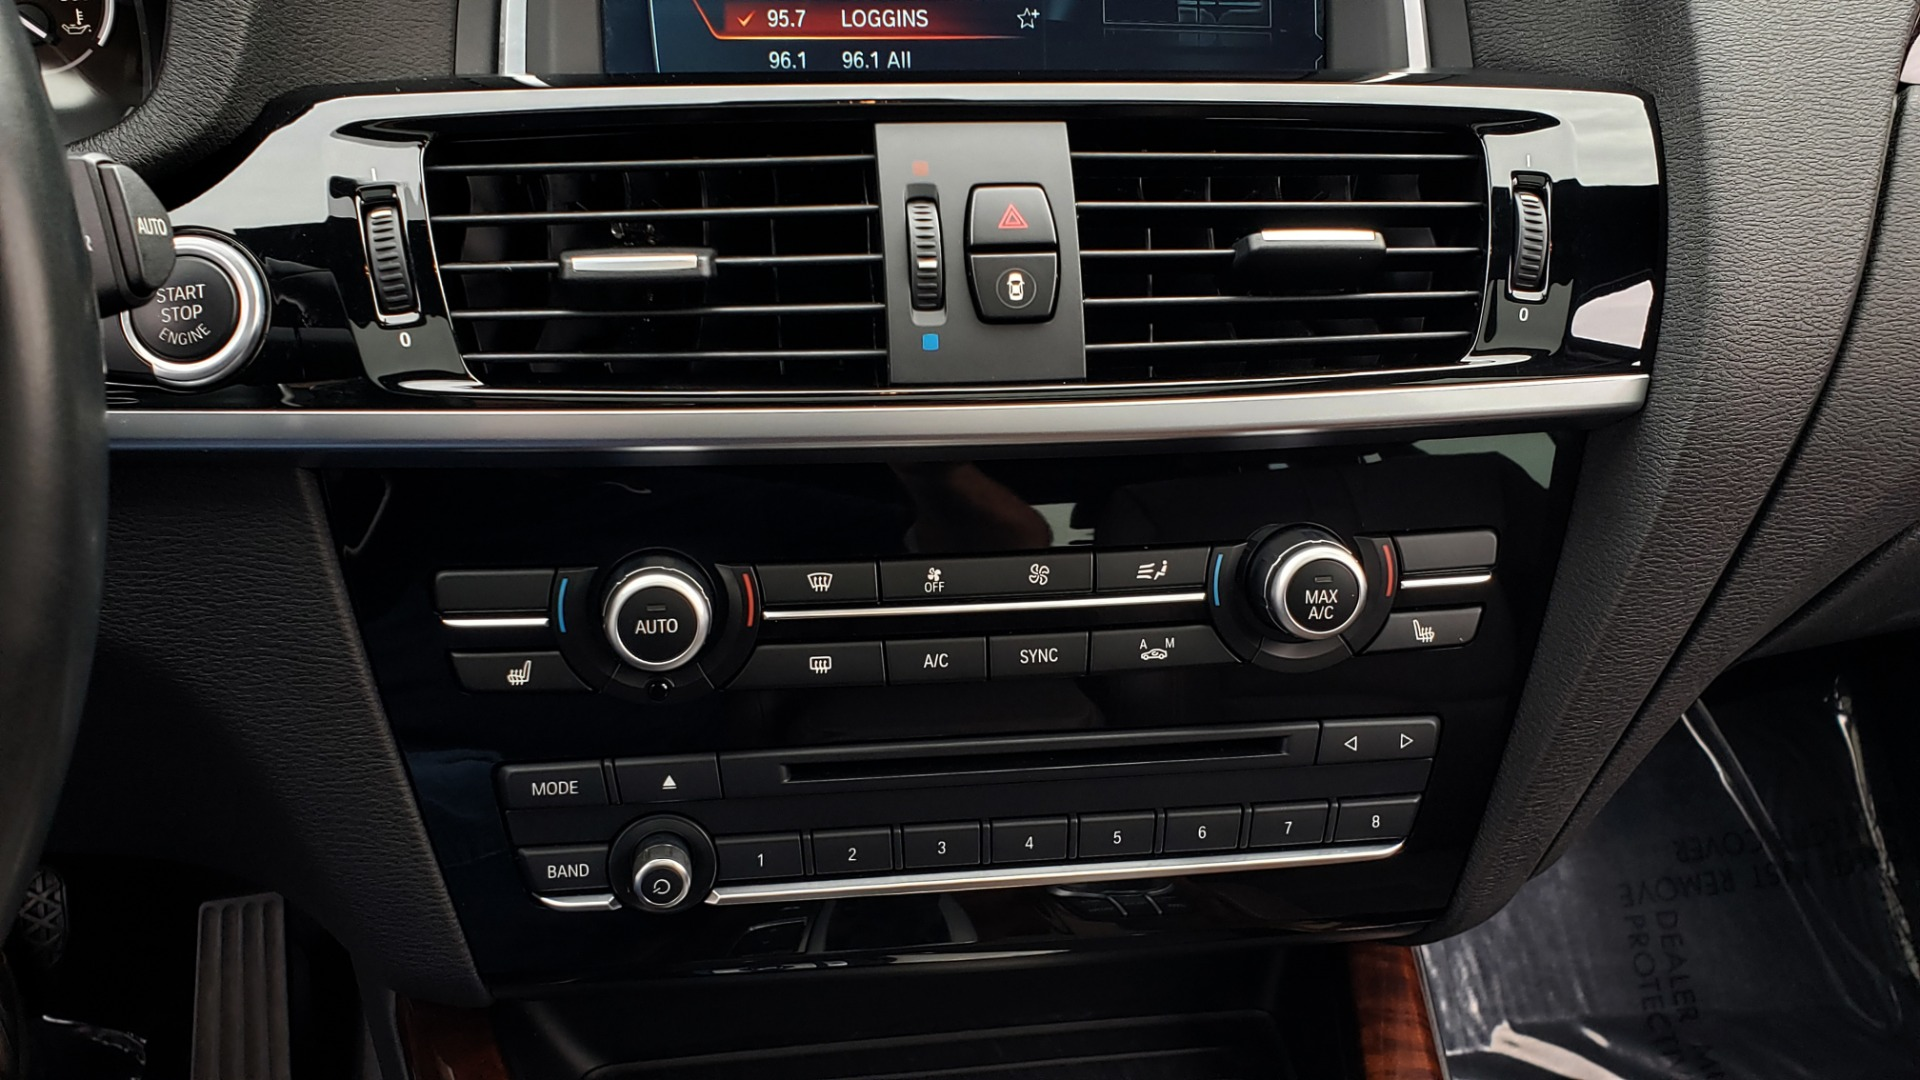 Used 2017 BMW X3 XDRIVE35I M-SPORT / DRVR ASST PLUS / TECHNOLOGY / HUD / BLIND SPOT for sale Sold at Formula Imports in Charlotte NC 28227 47